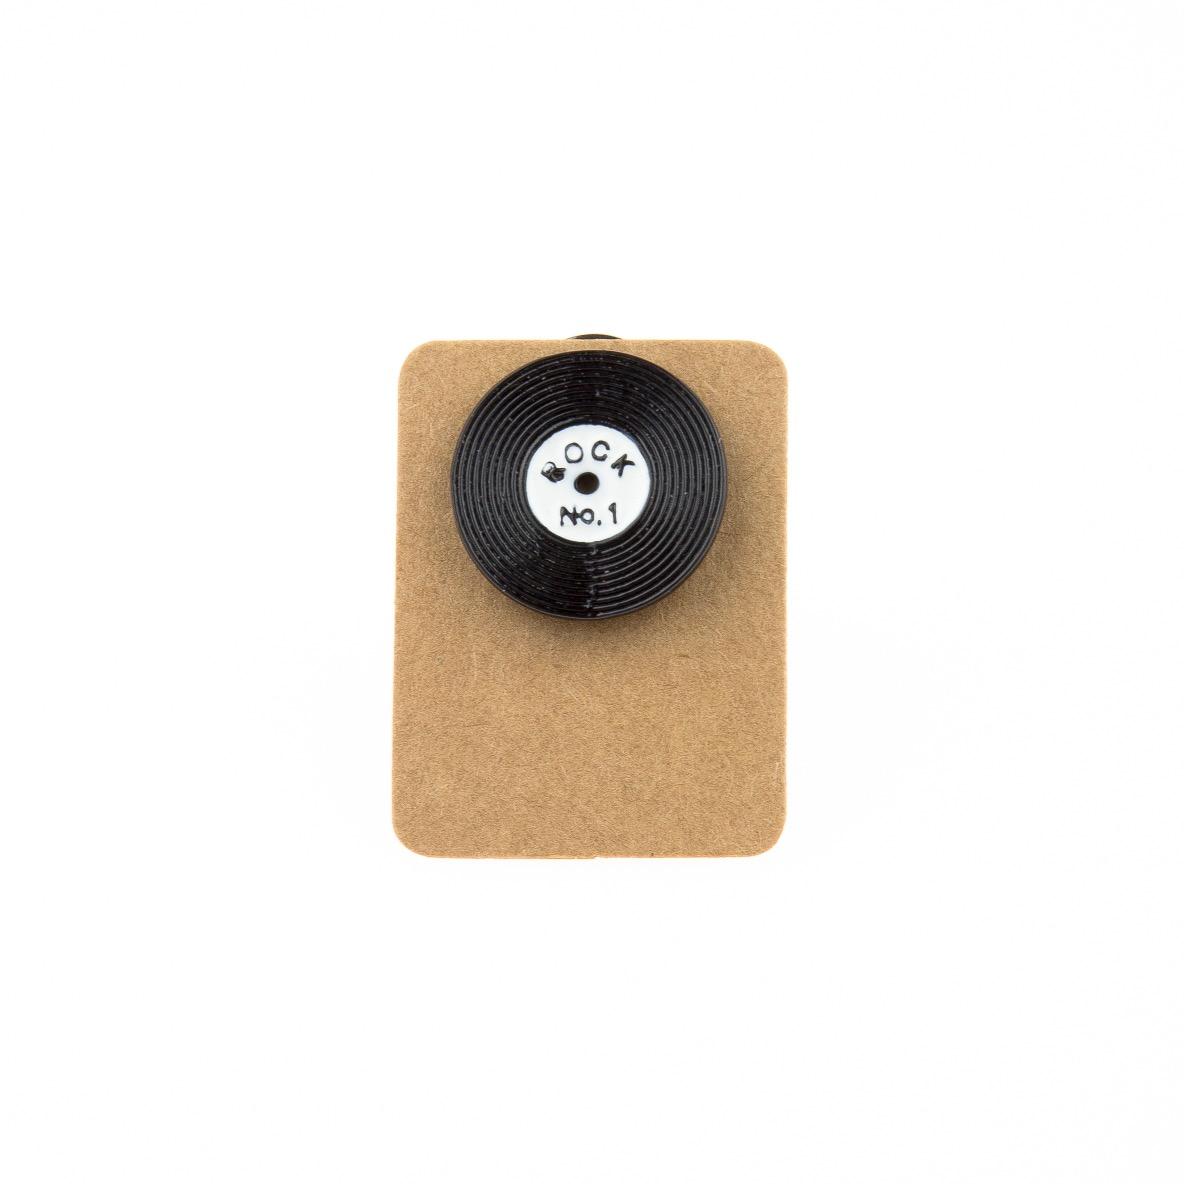 Metal Vinyl Rock No:1 Enamel Pin Badge